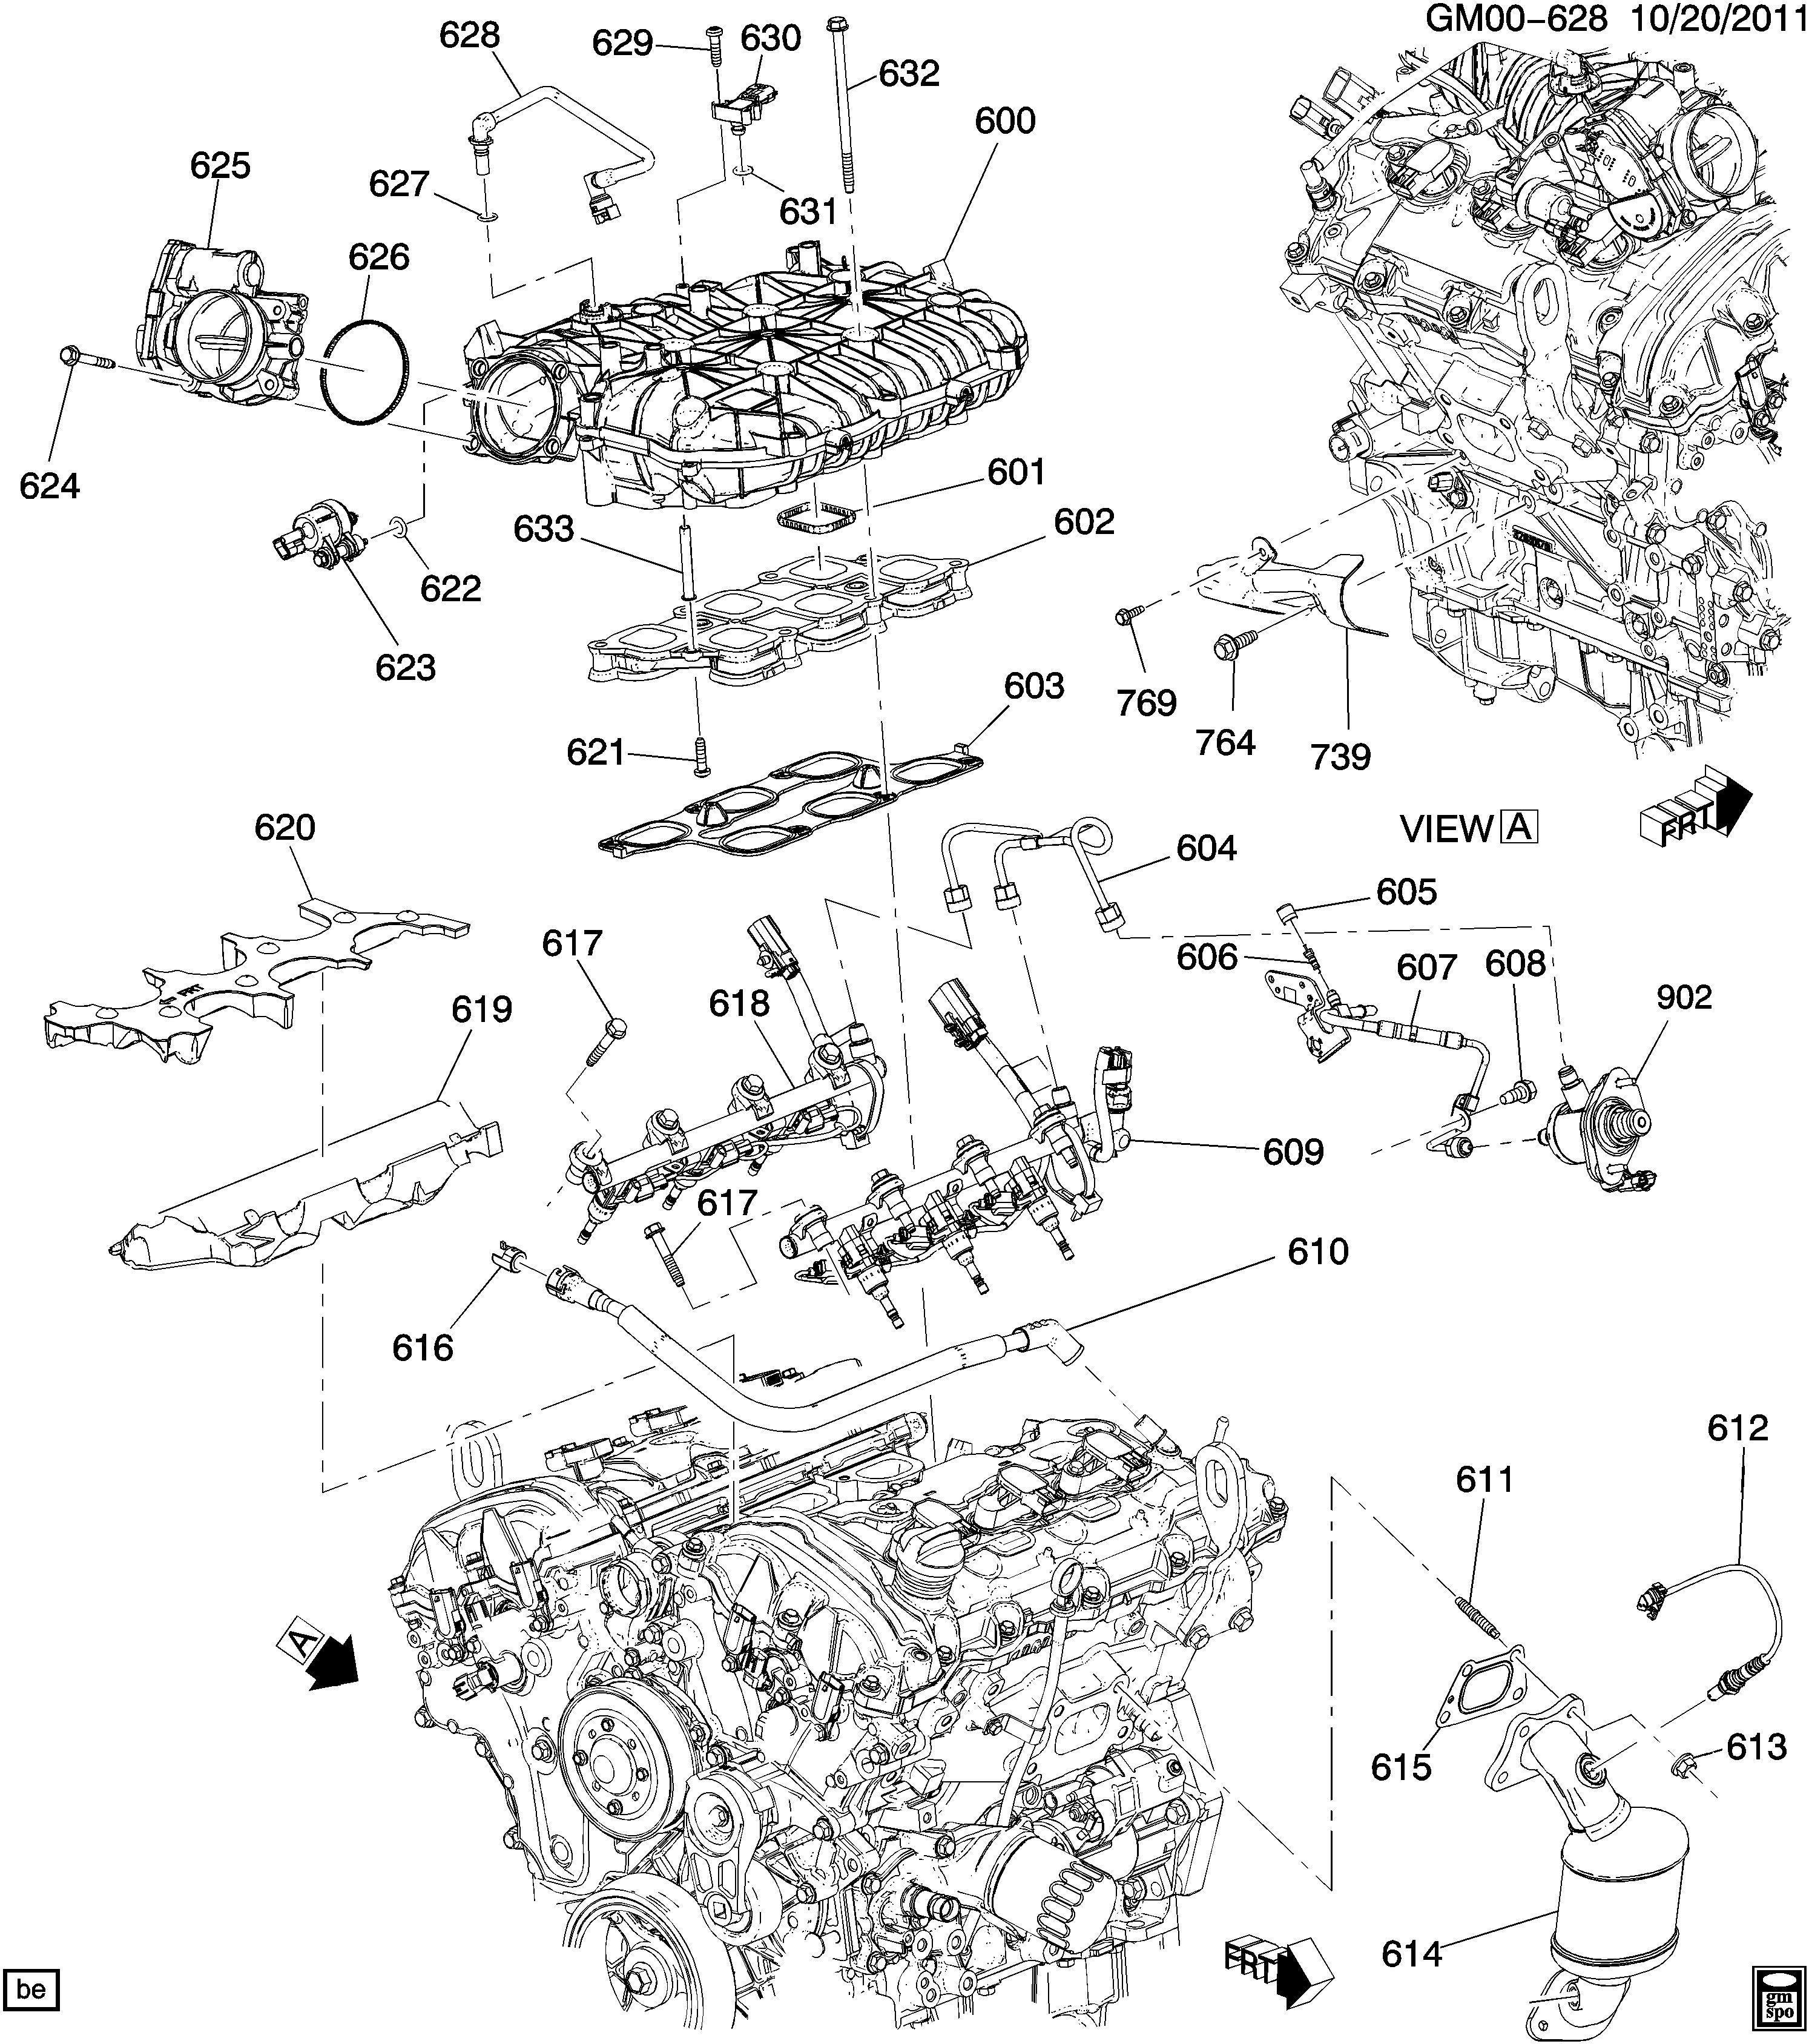 Cadillac SRX Stud. Catalytic converter. Exhaust muffler